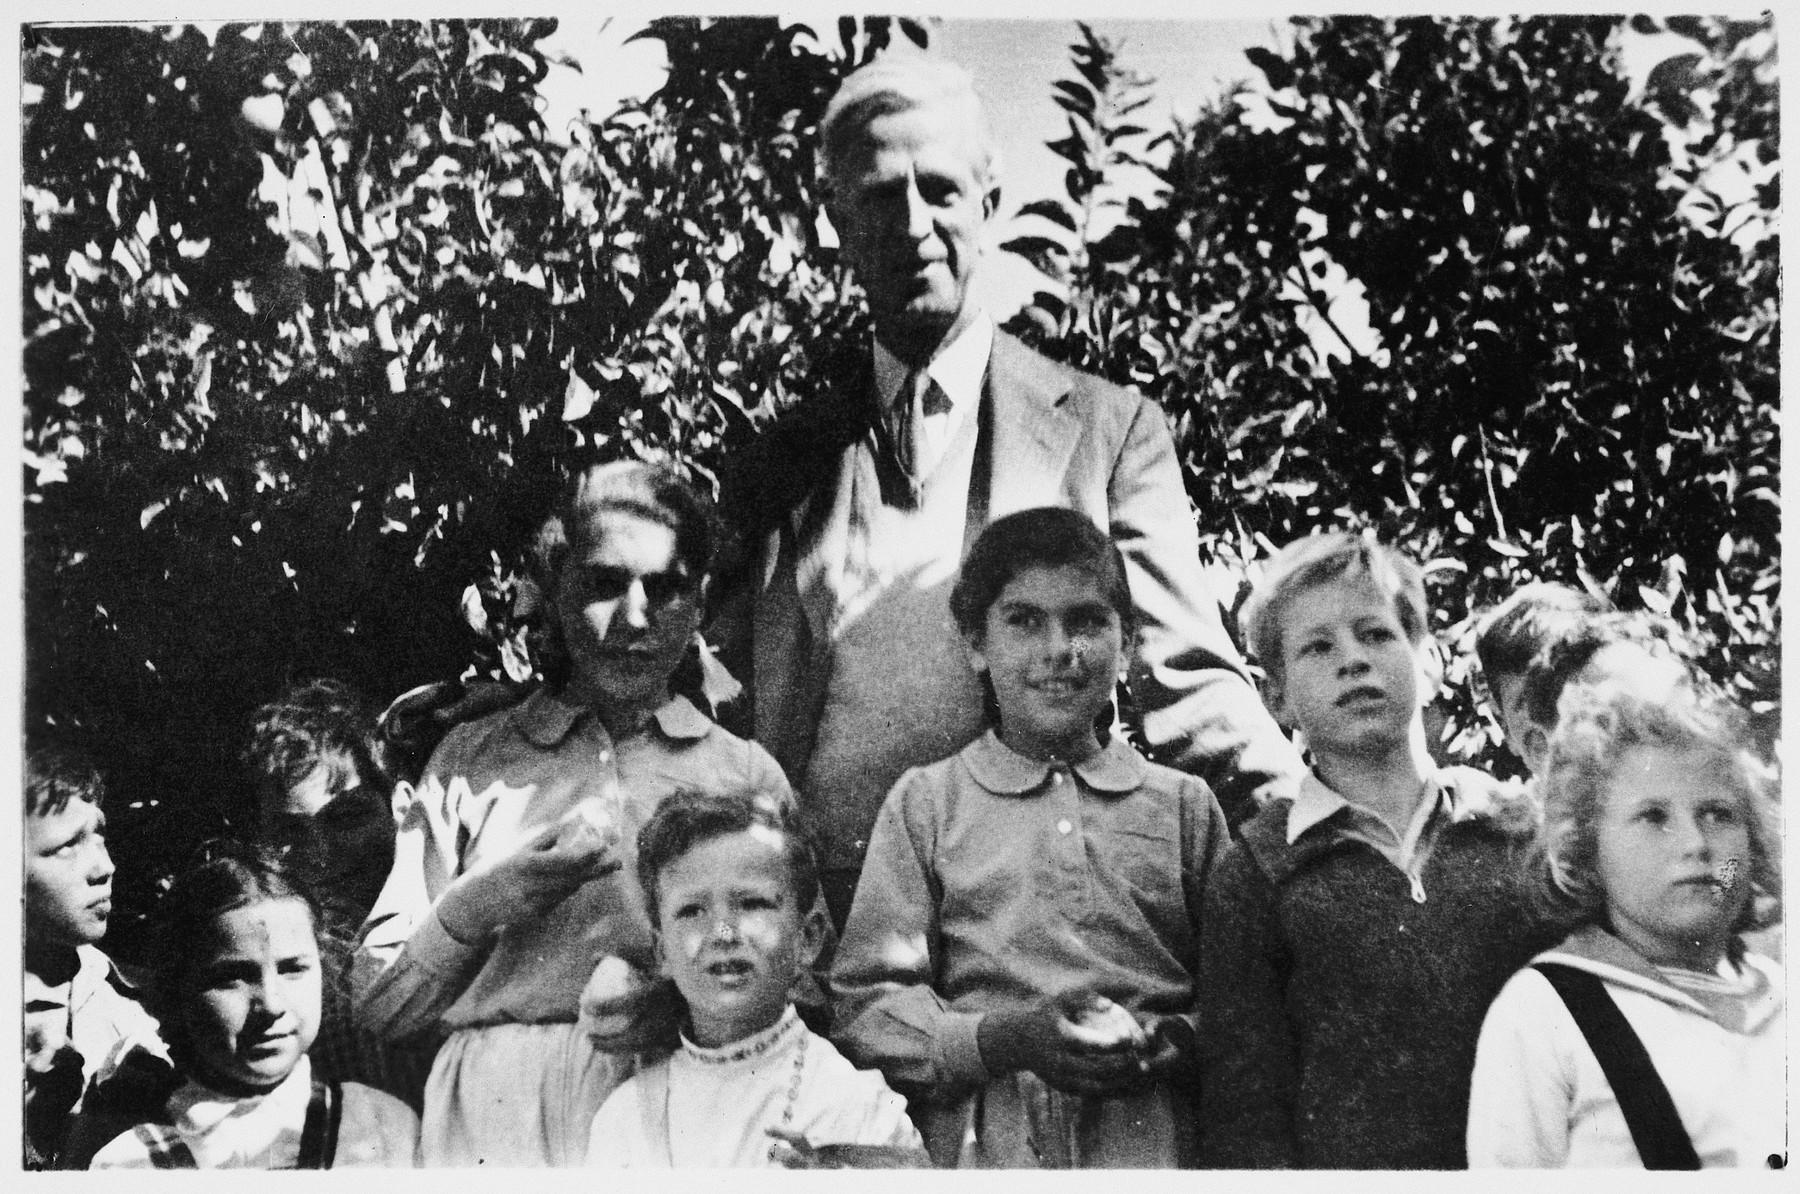 U.S. Ambassador to Israel, James G. McDonald, poses with a group of Israeli children.